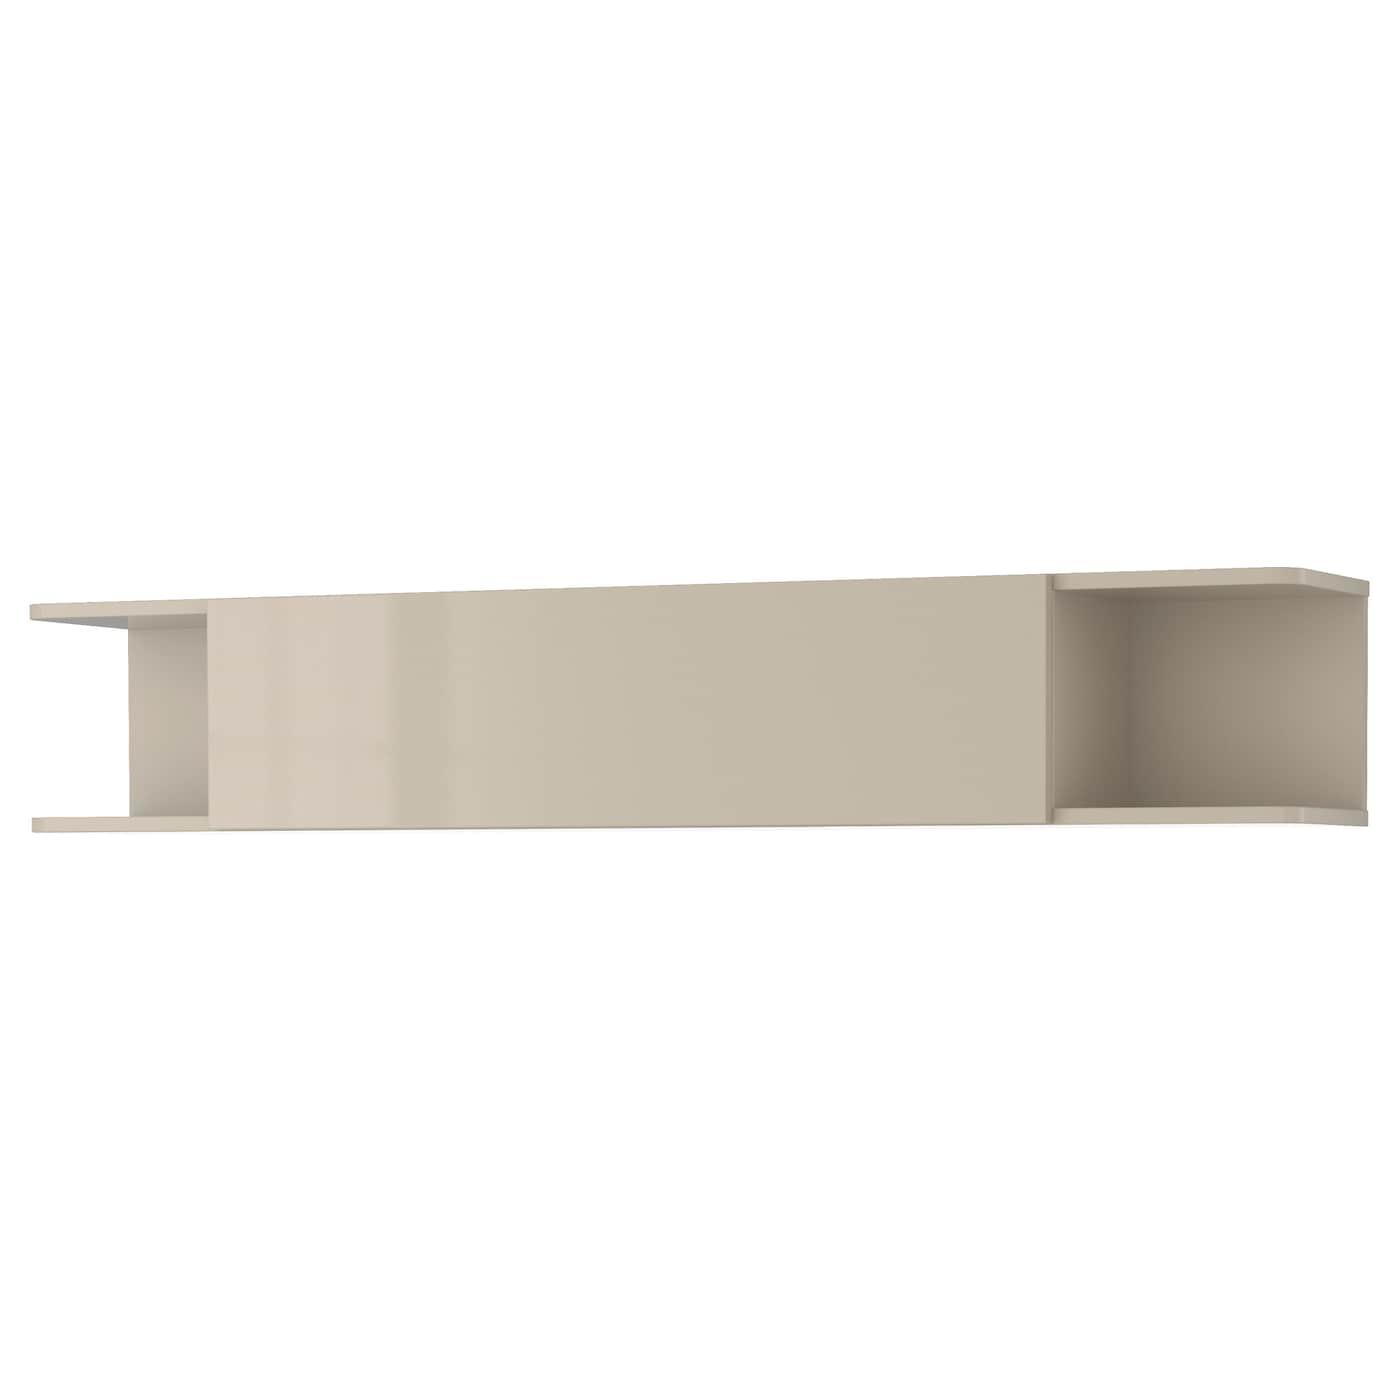 mostorp wall shelf high gloss beige 160 x 27 cm ikea. Black Bedroom Furniture Sets. Home Design Ideas